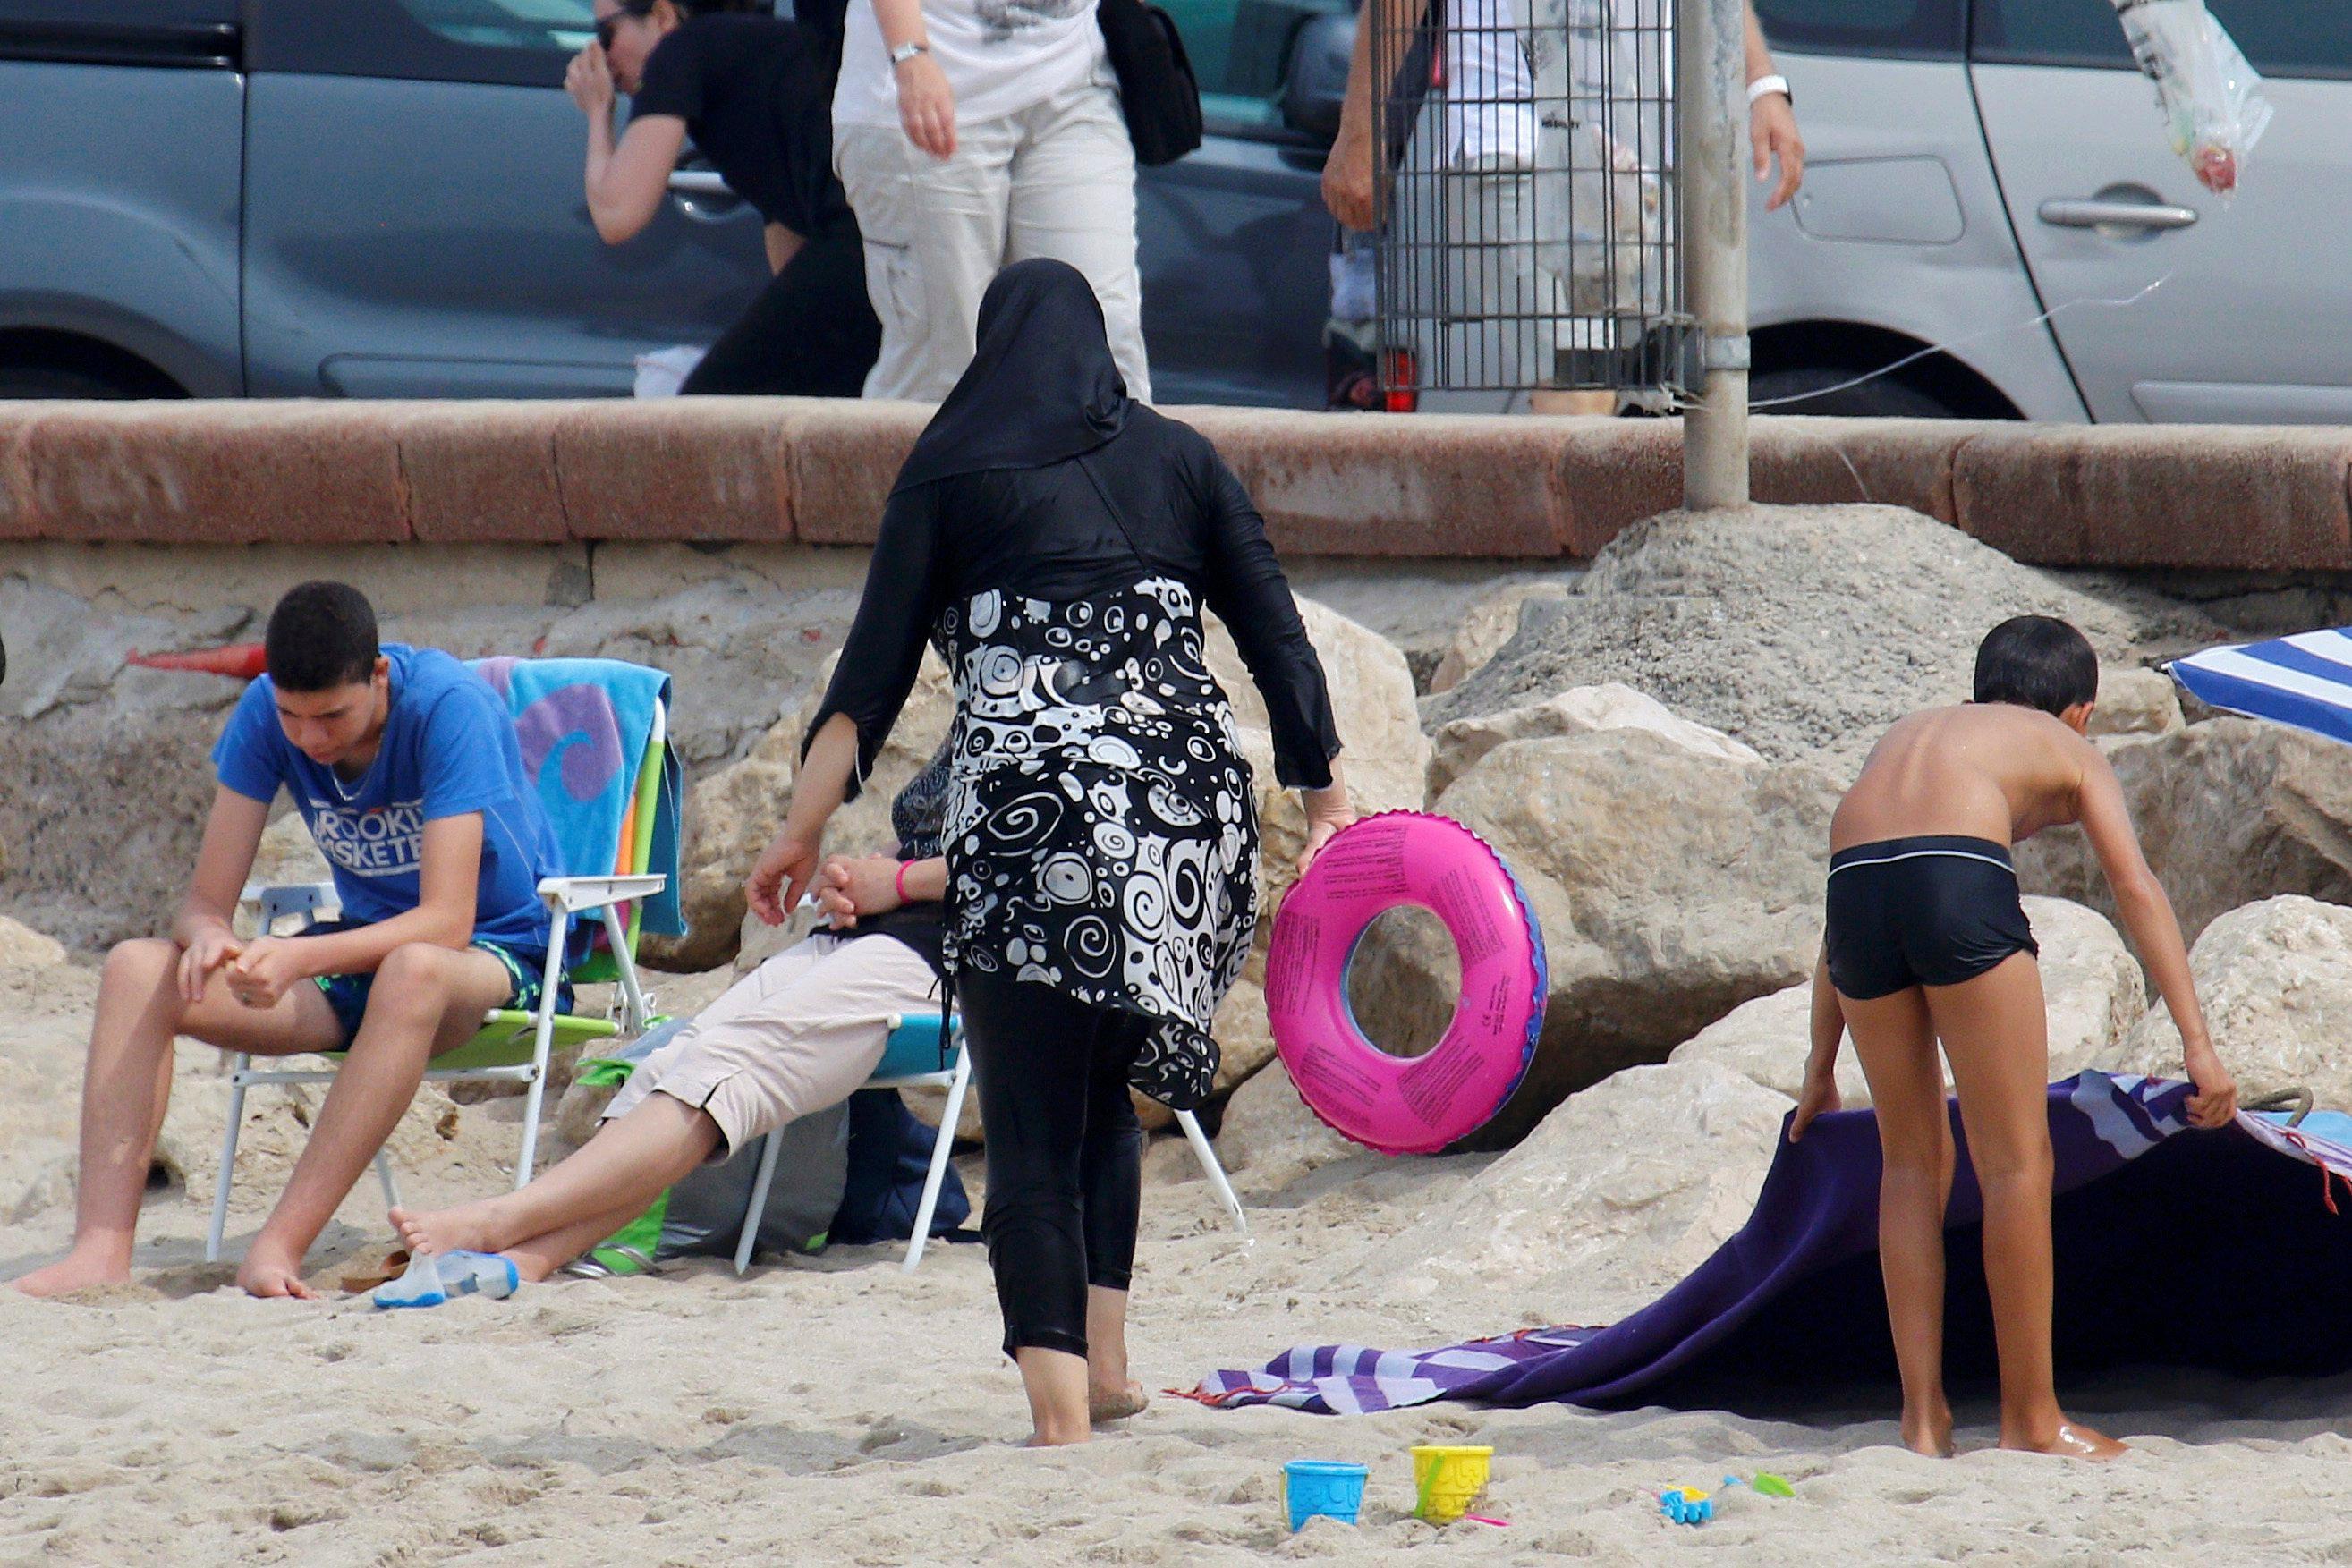 Mujer musulmana usa burkini en playas francesas